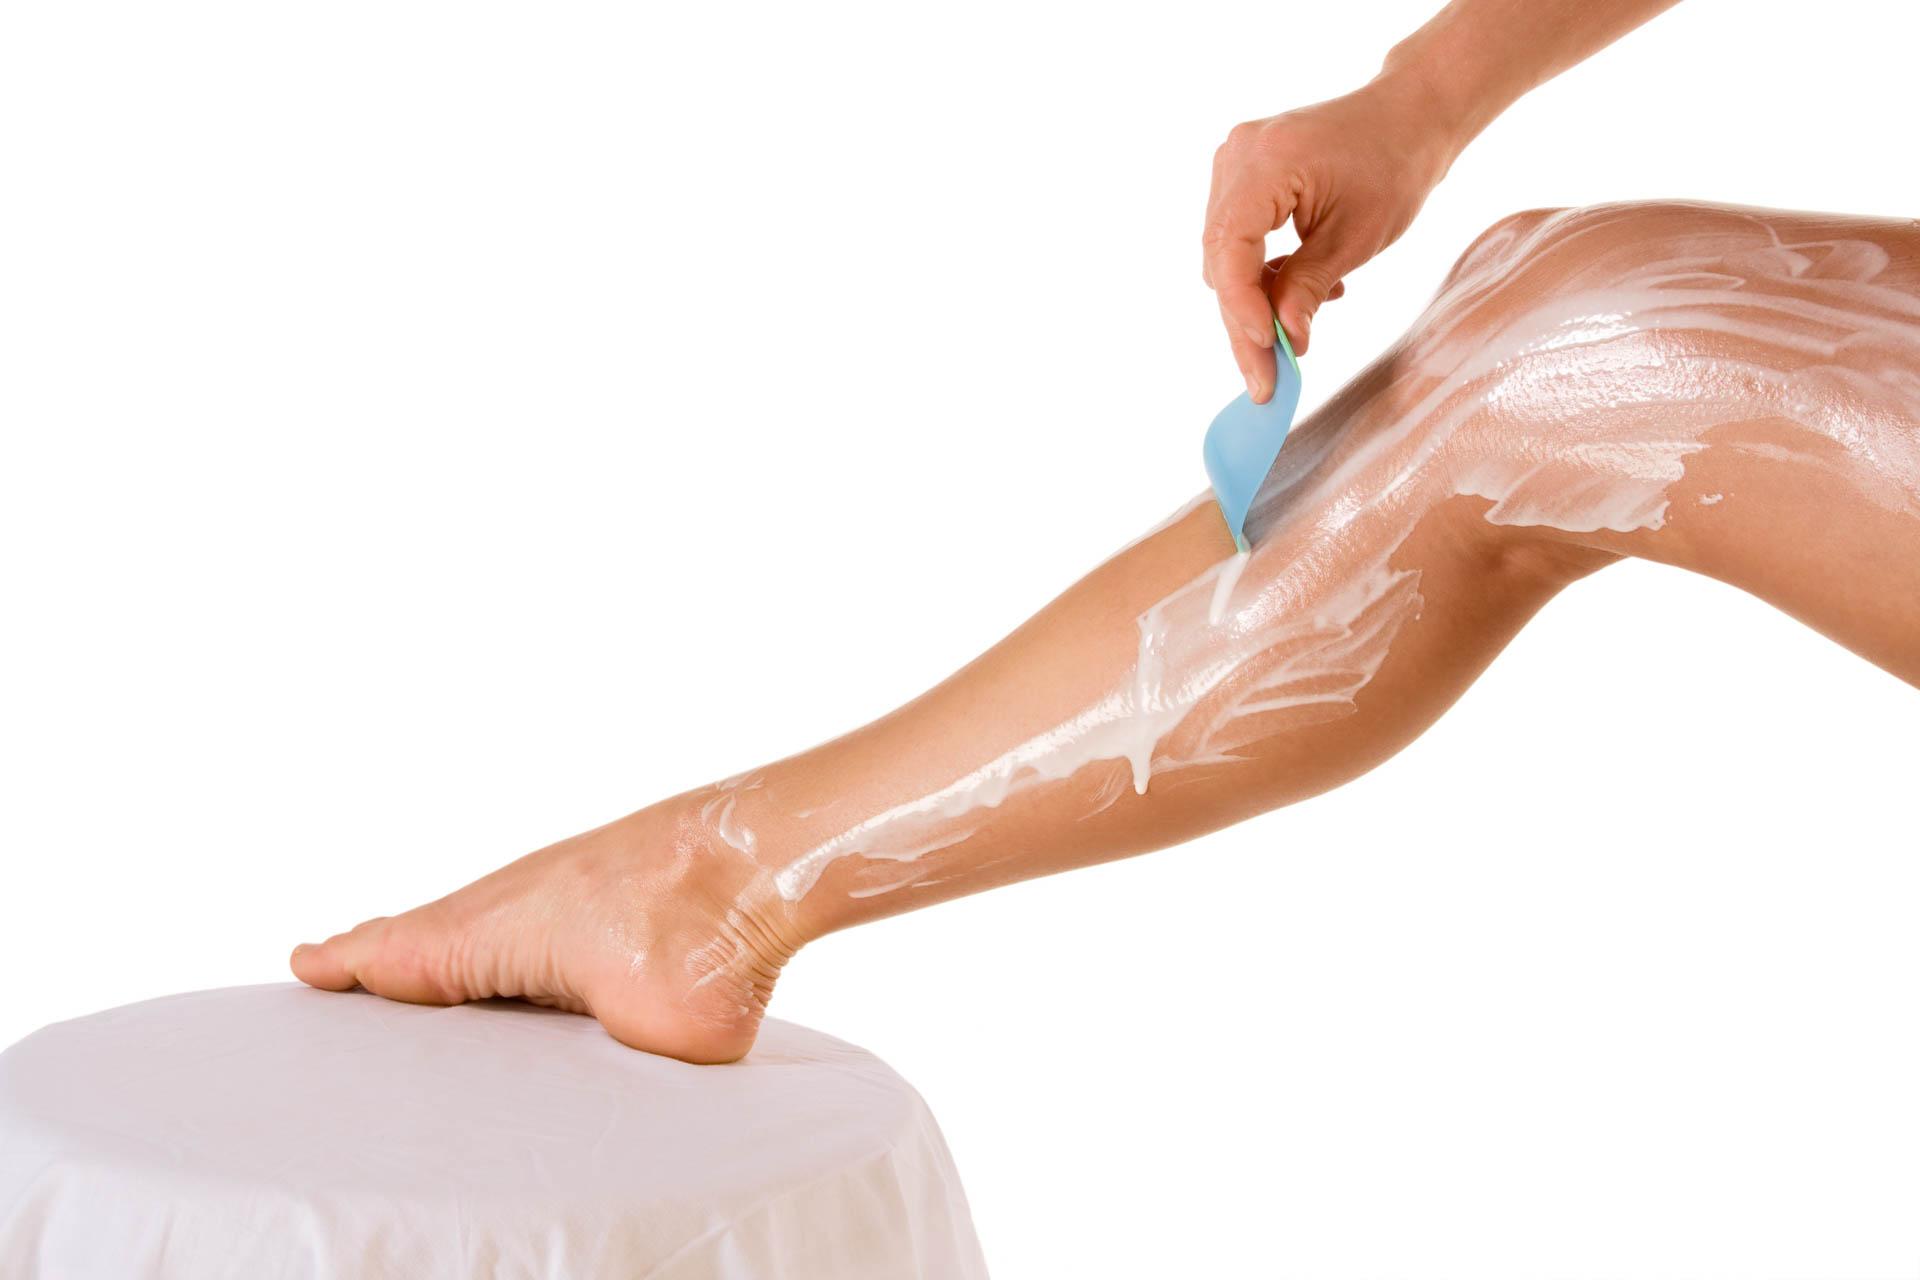 Shaving - woman removing leg hair (close up)